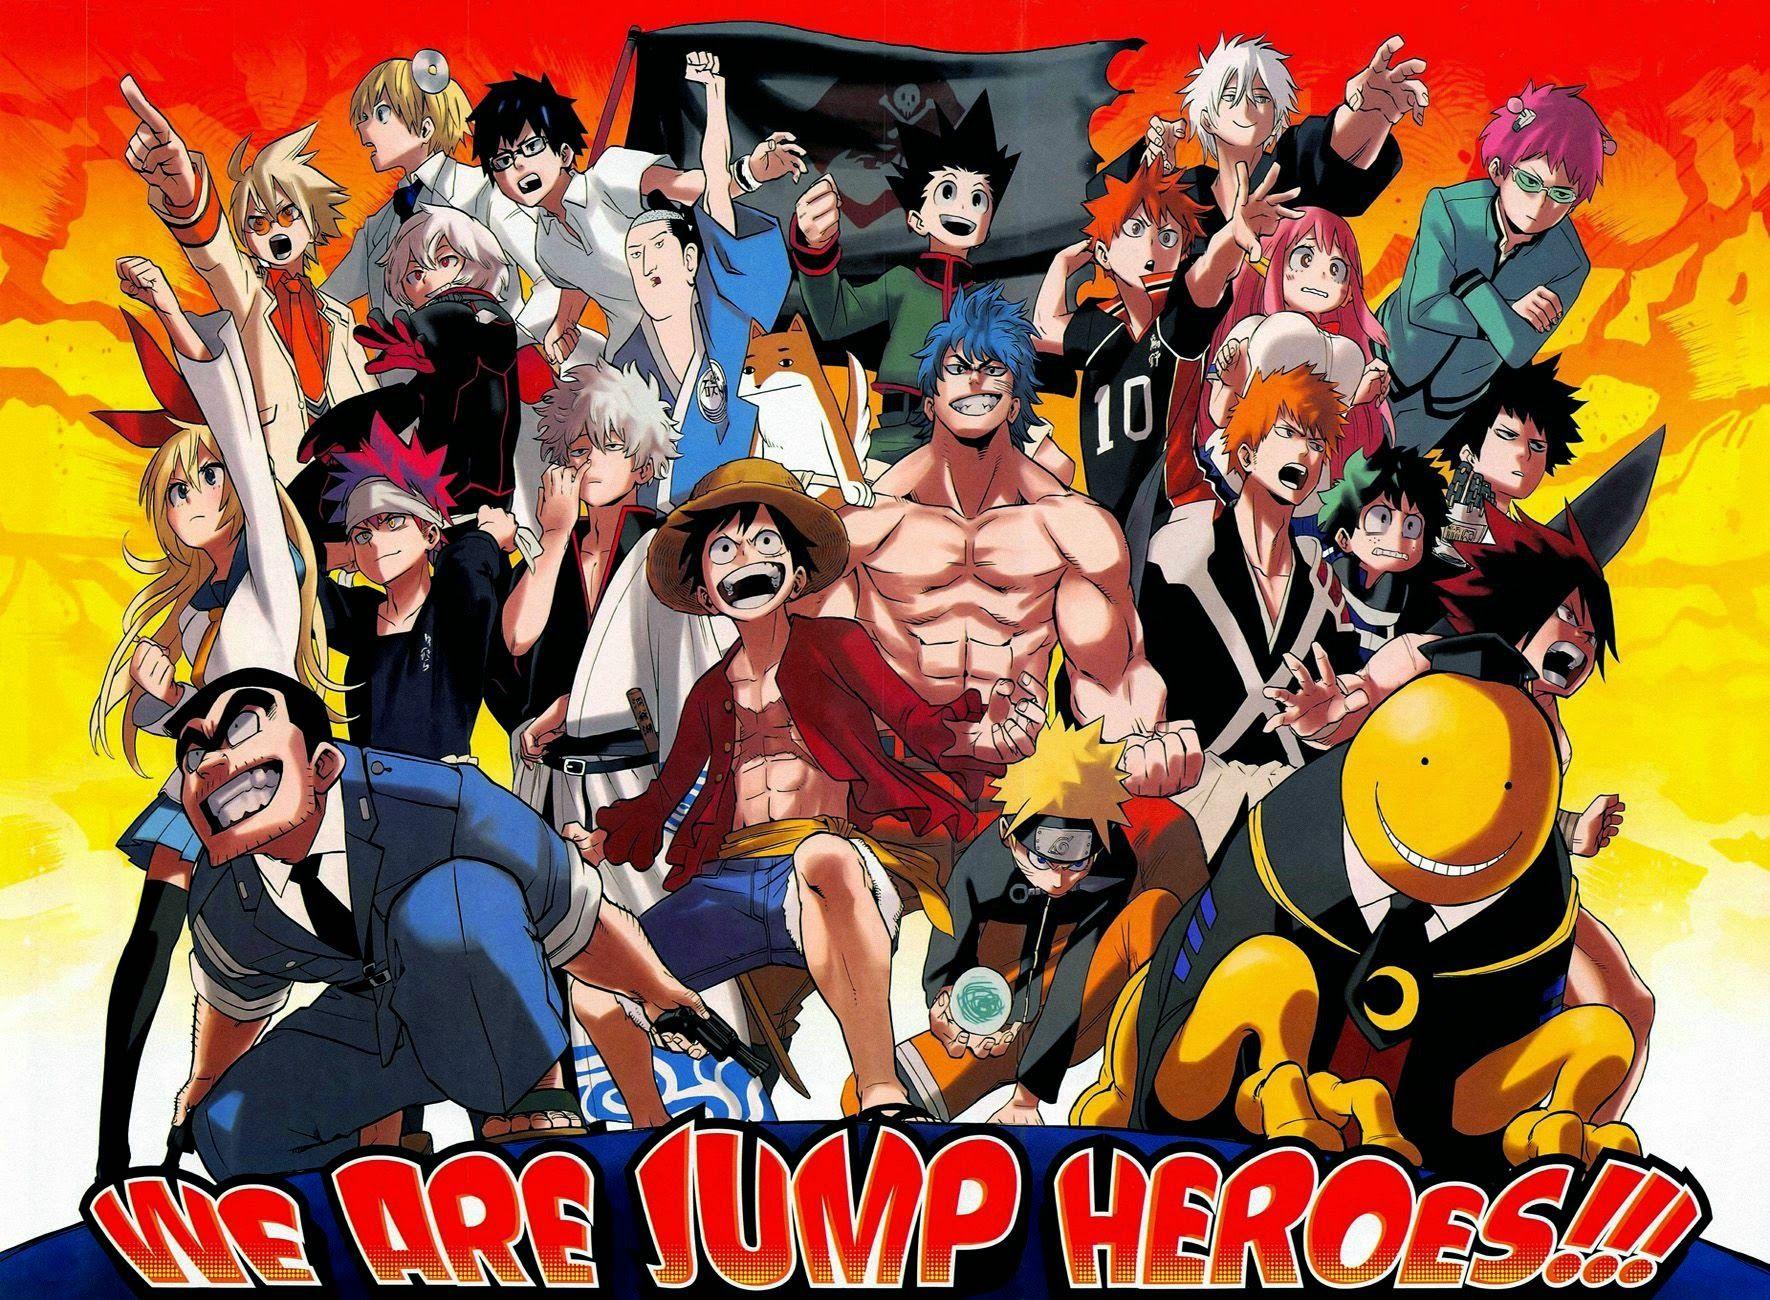 Boku No Hero Academia 25 อ าน Boku No Hero Academia 25 Th Boku No Hero Academia ตอนท 25 แปลไทย ม งงะ Boku No Hero Academia Ch 2 Anime Anime Crossover Comics